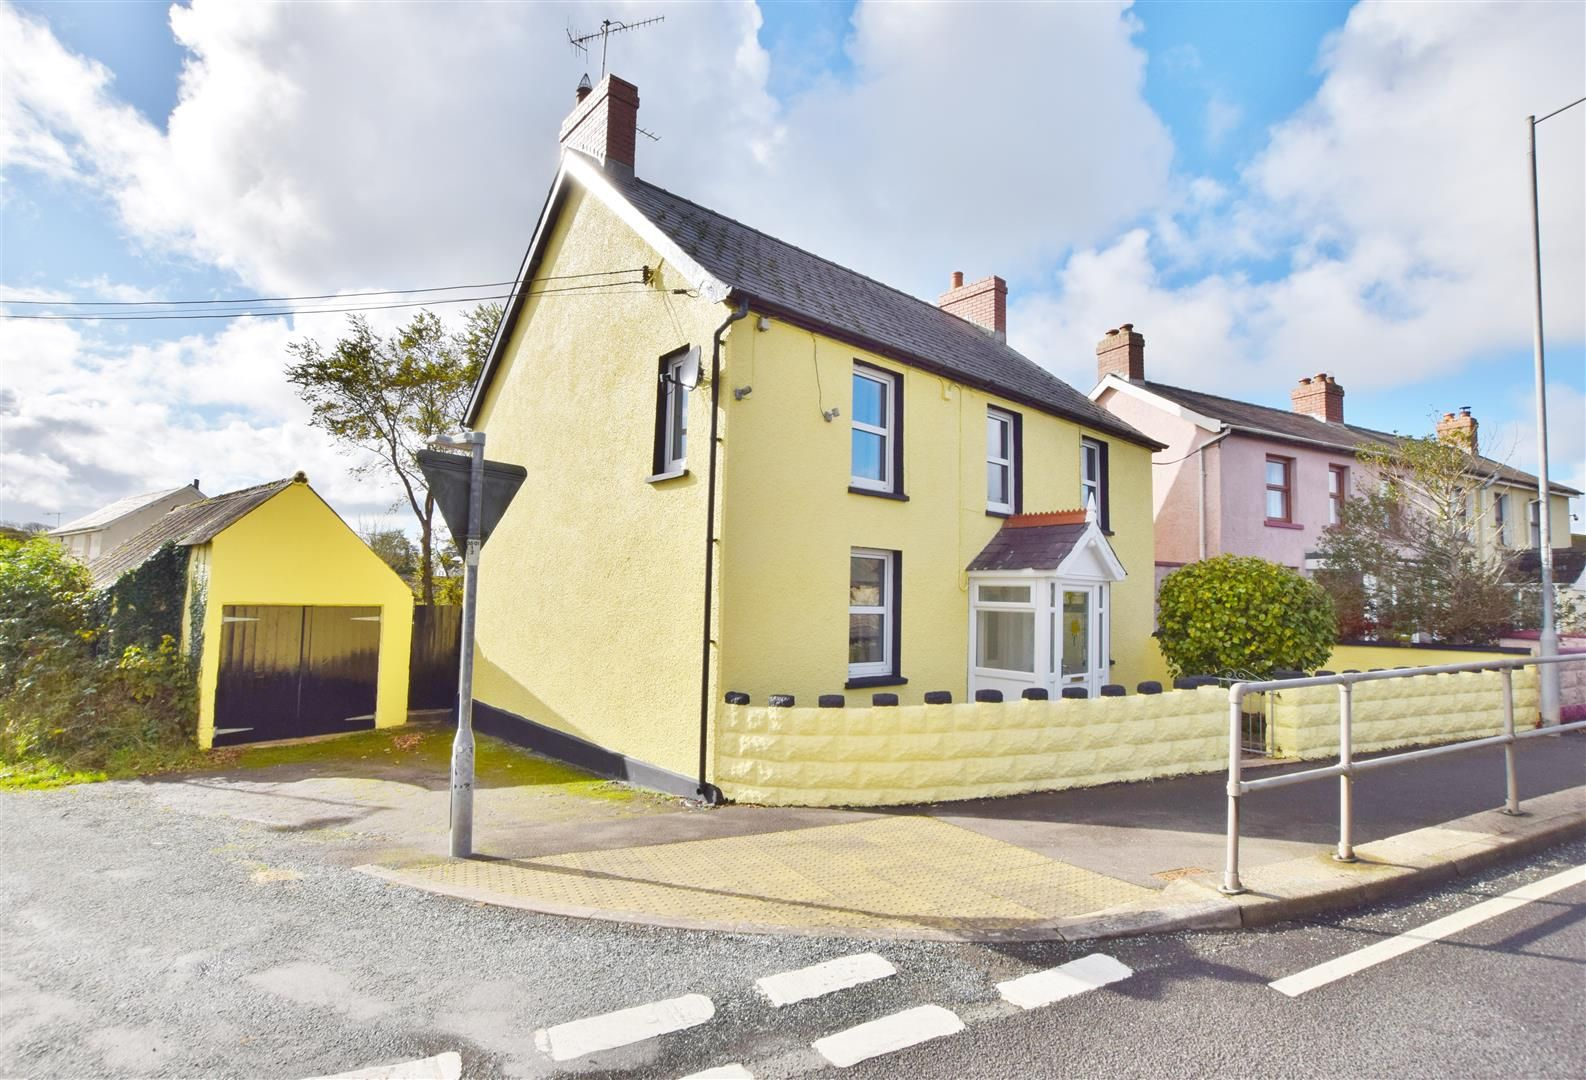 Property photo 1 of 22. Dsc_0718 (2).Jpg